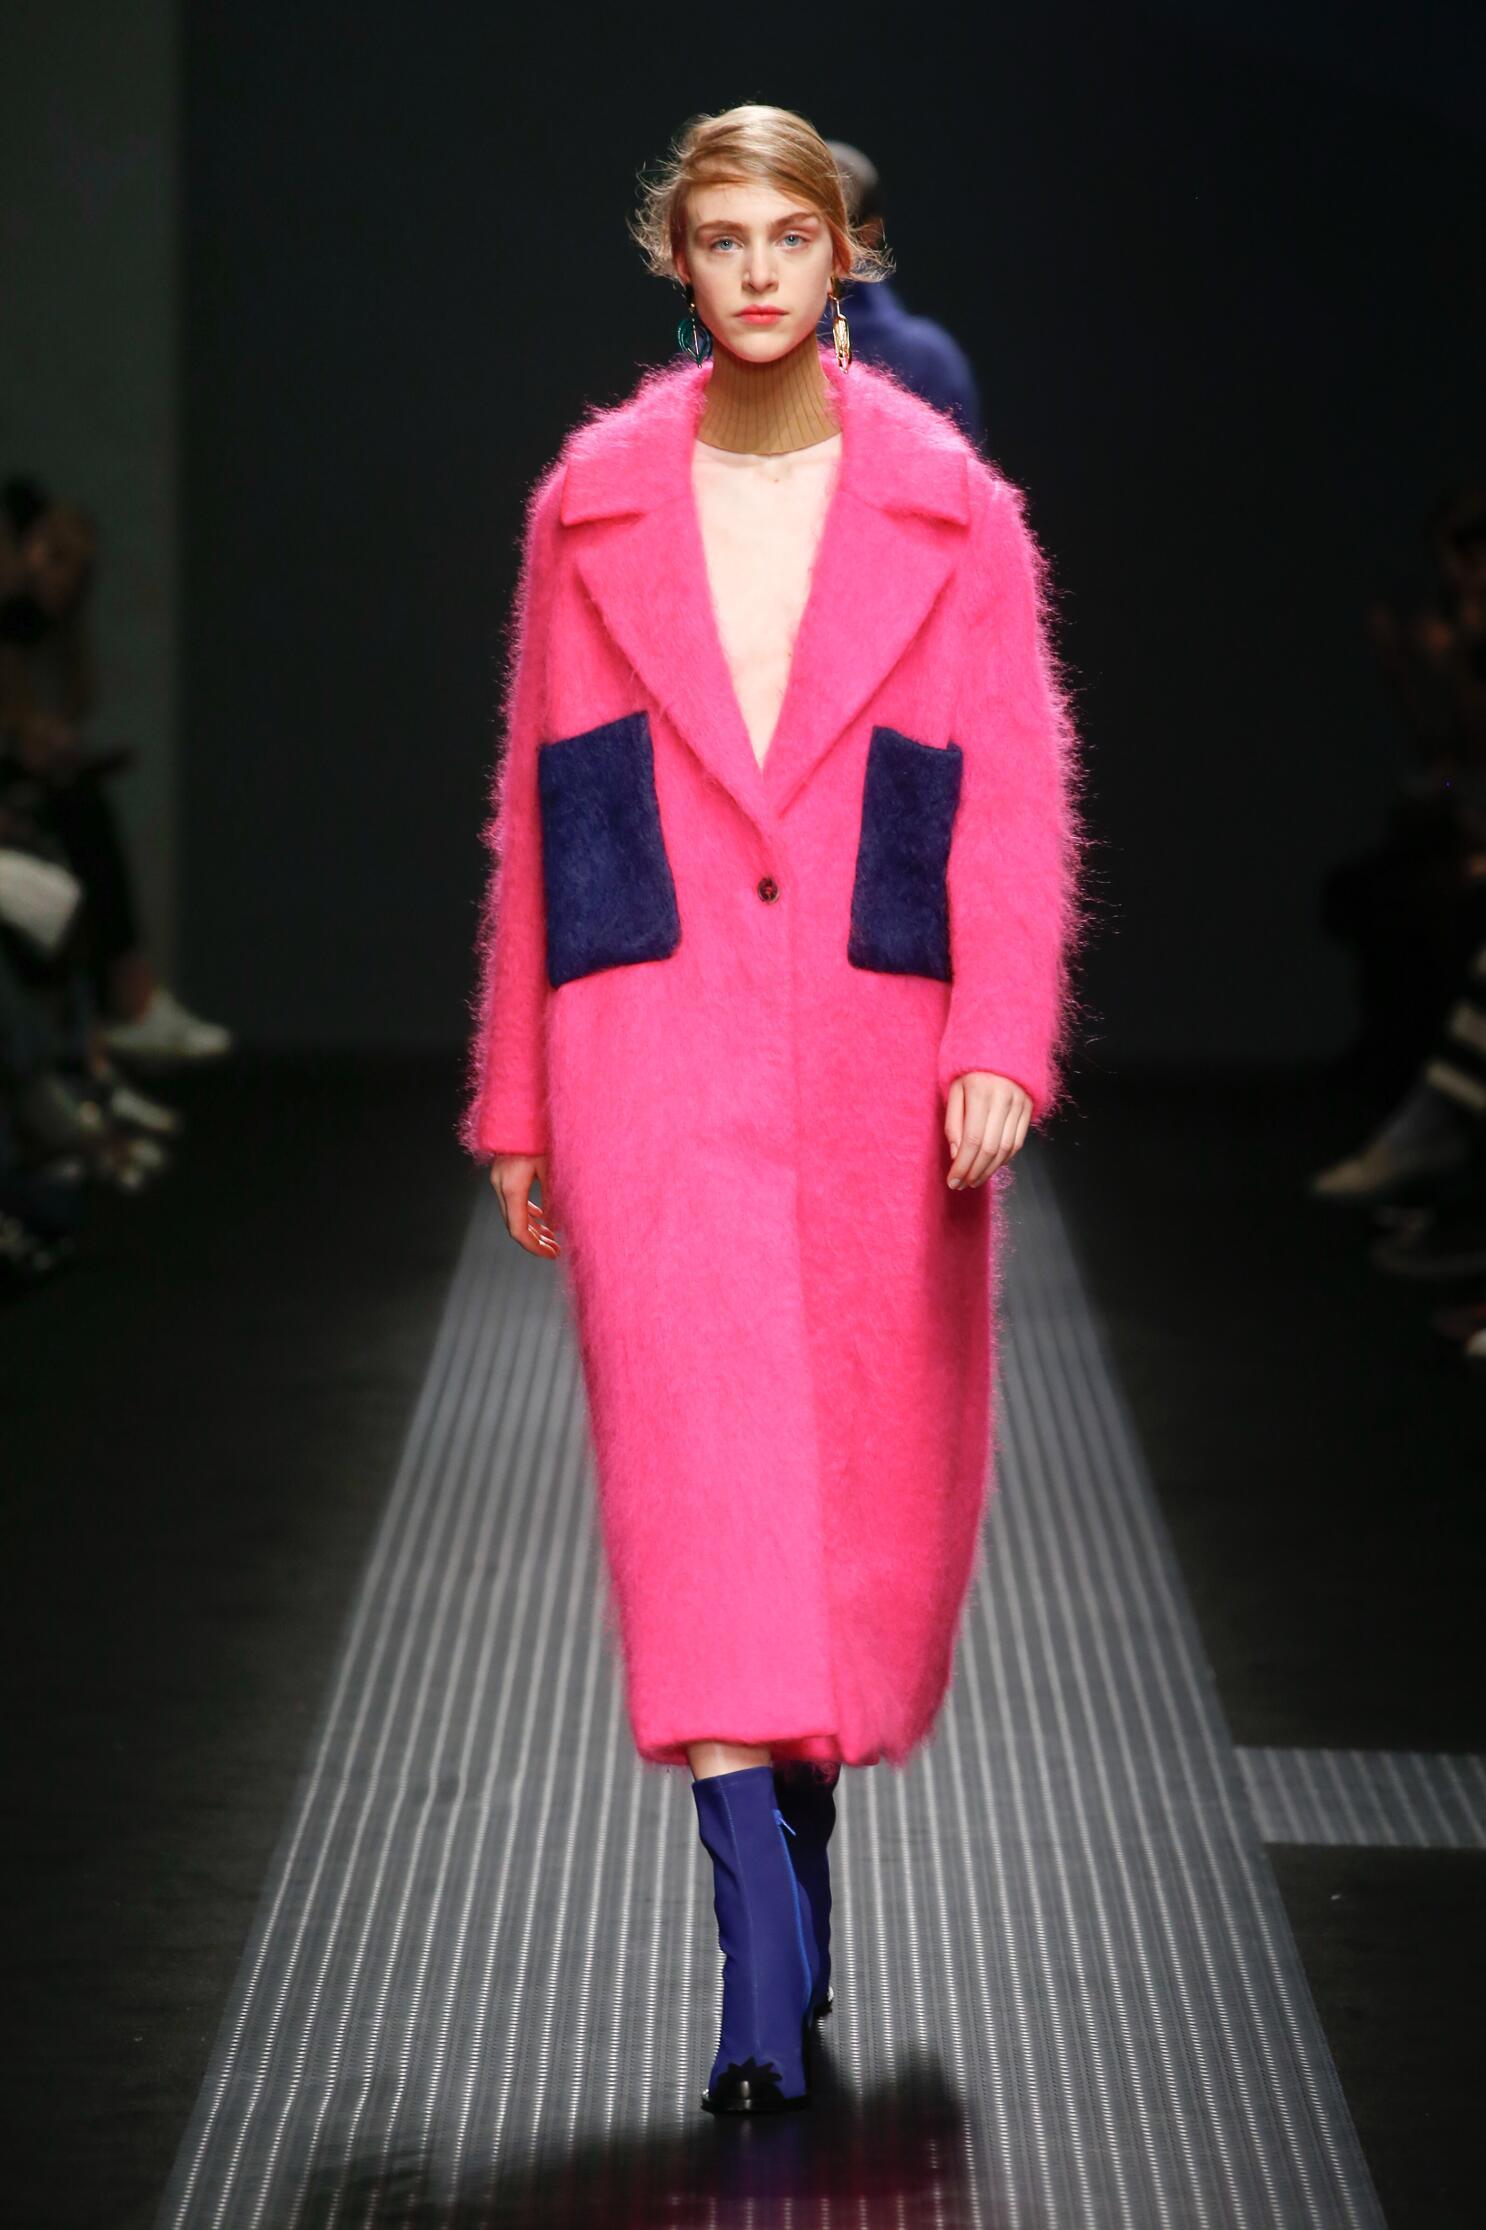 2015 Fashion Woman Model Msgm Collection Catwalk